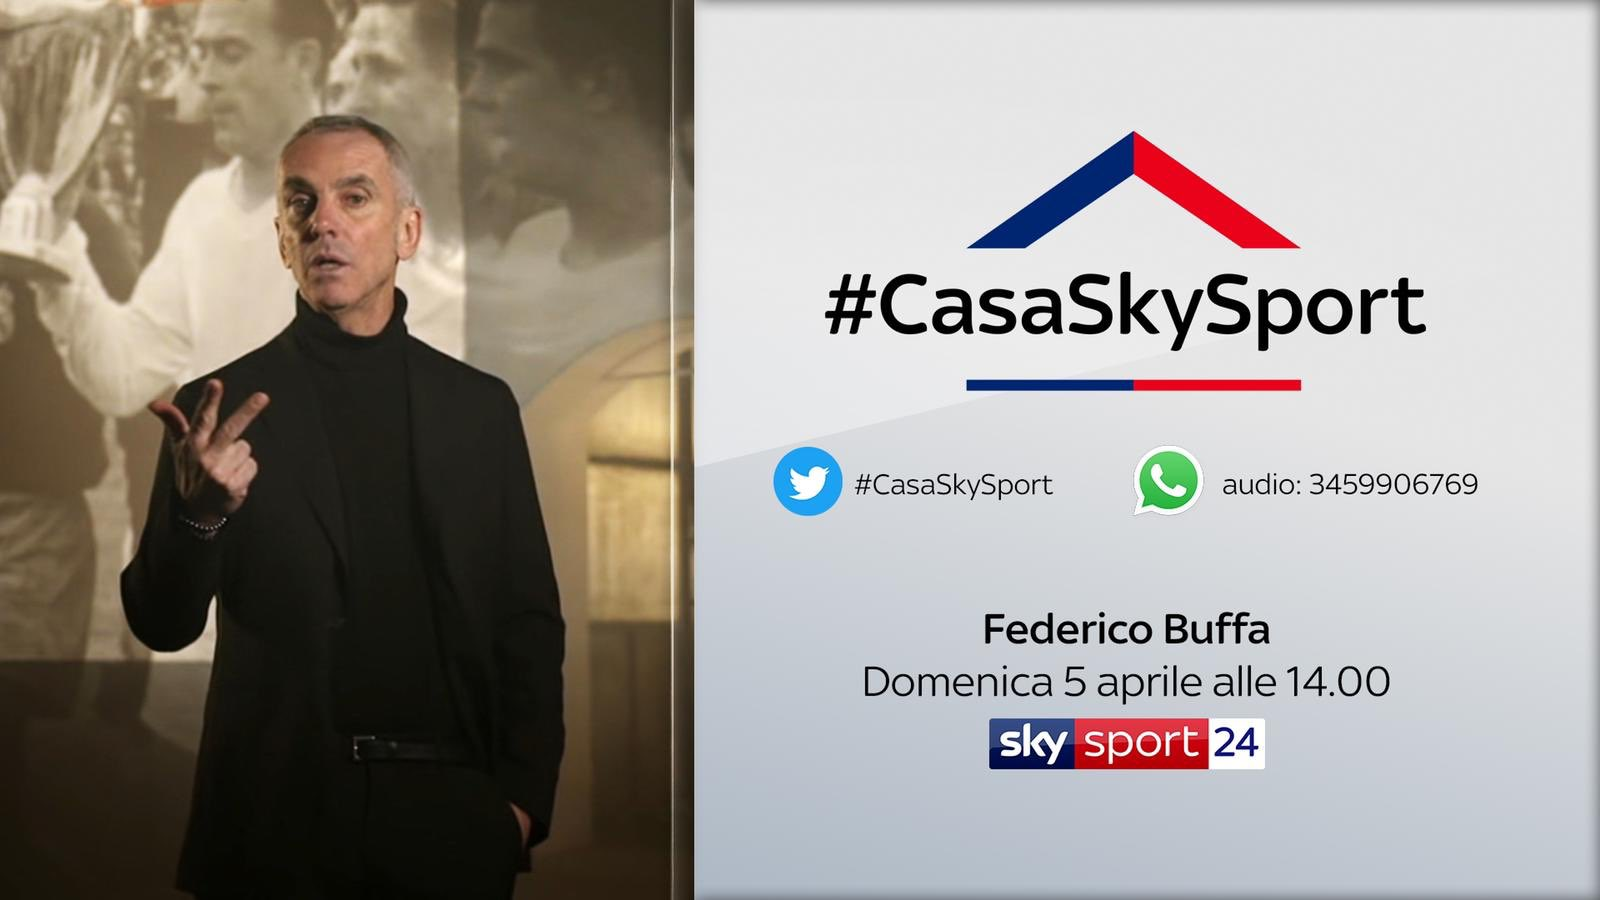 Federico Buffa risponde alle domande a #CasaSkySport